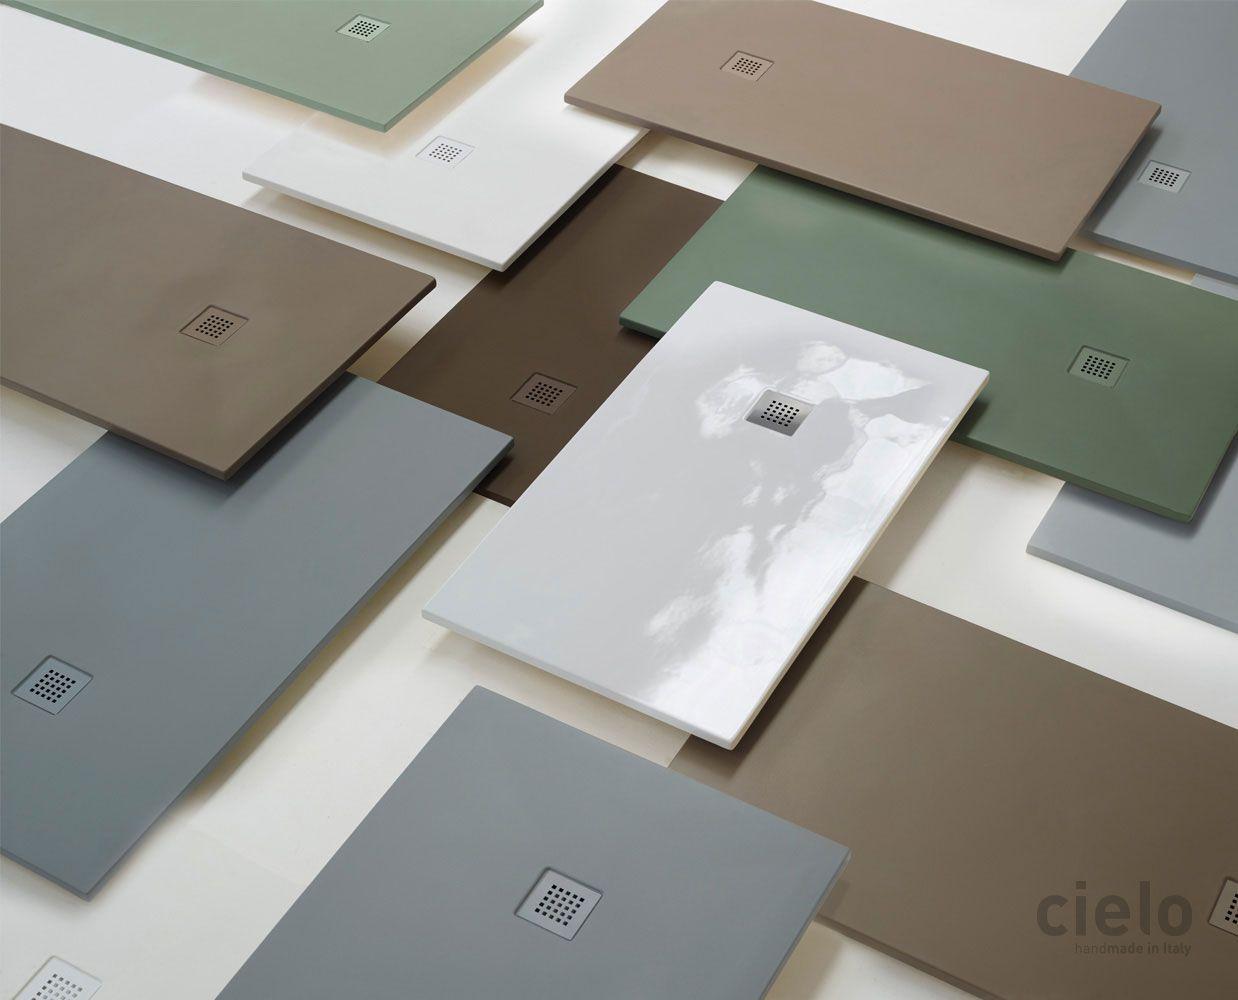 Italian bathroom fittings - Ceramica Cielo S P A Handmade Italian Sanitary Ware Design